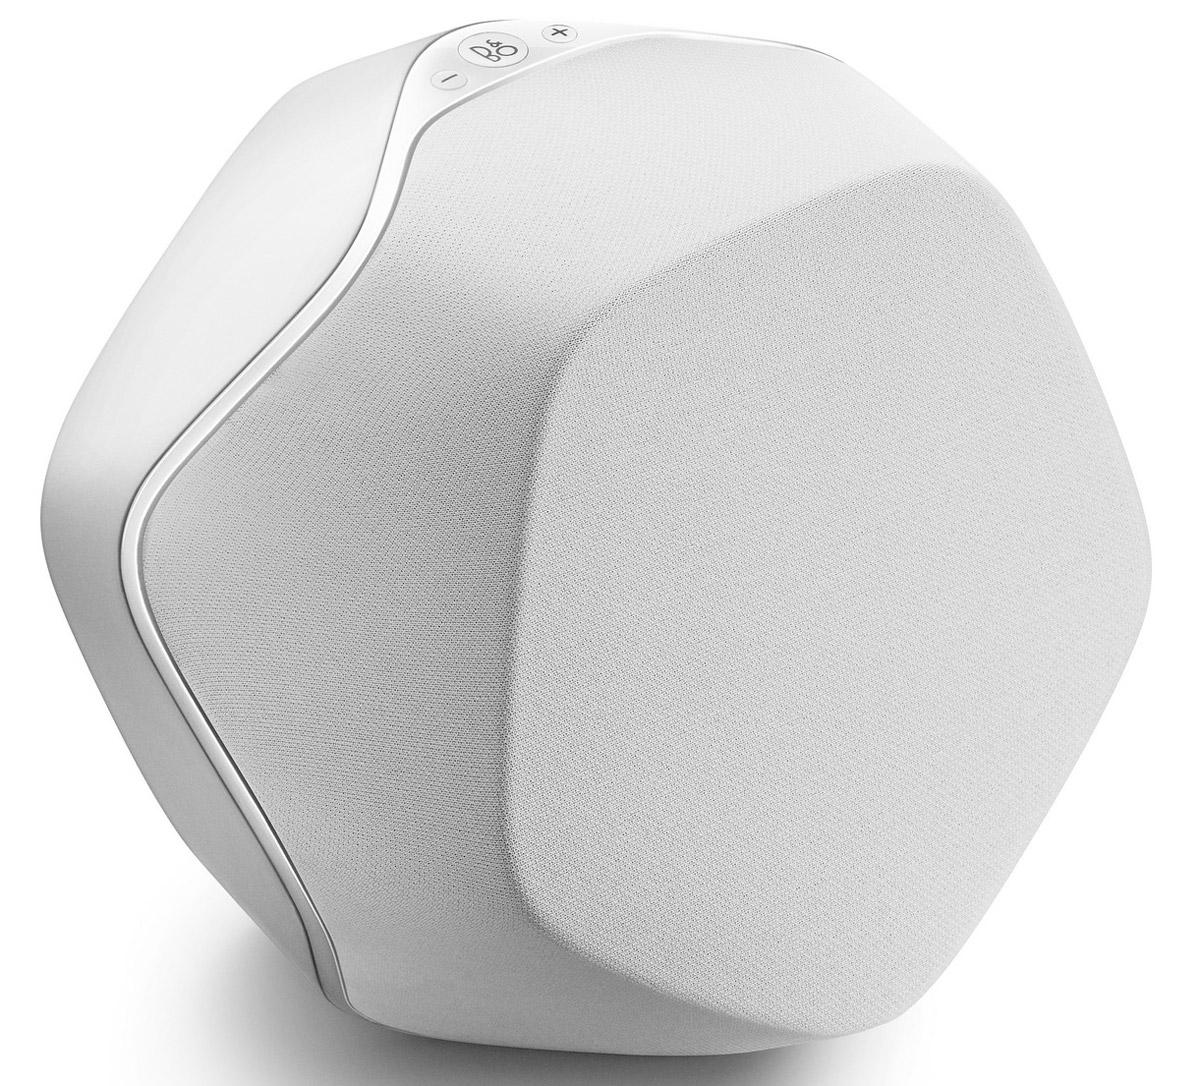 Bang & Olufsen BeoPlay S3, White портативная акустическая система s3 2 16 dgmedia